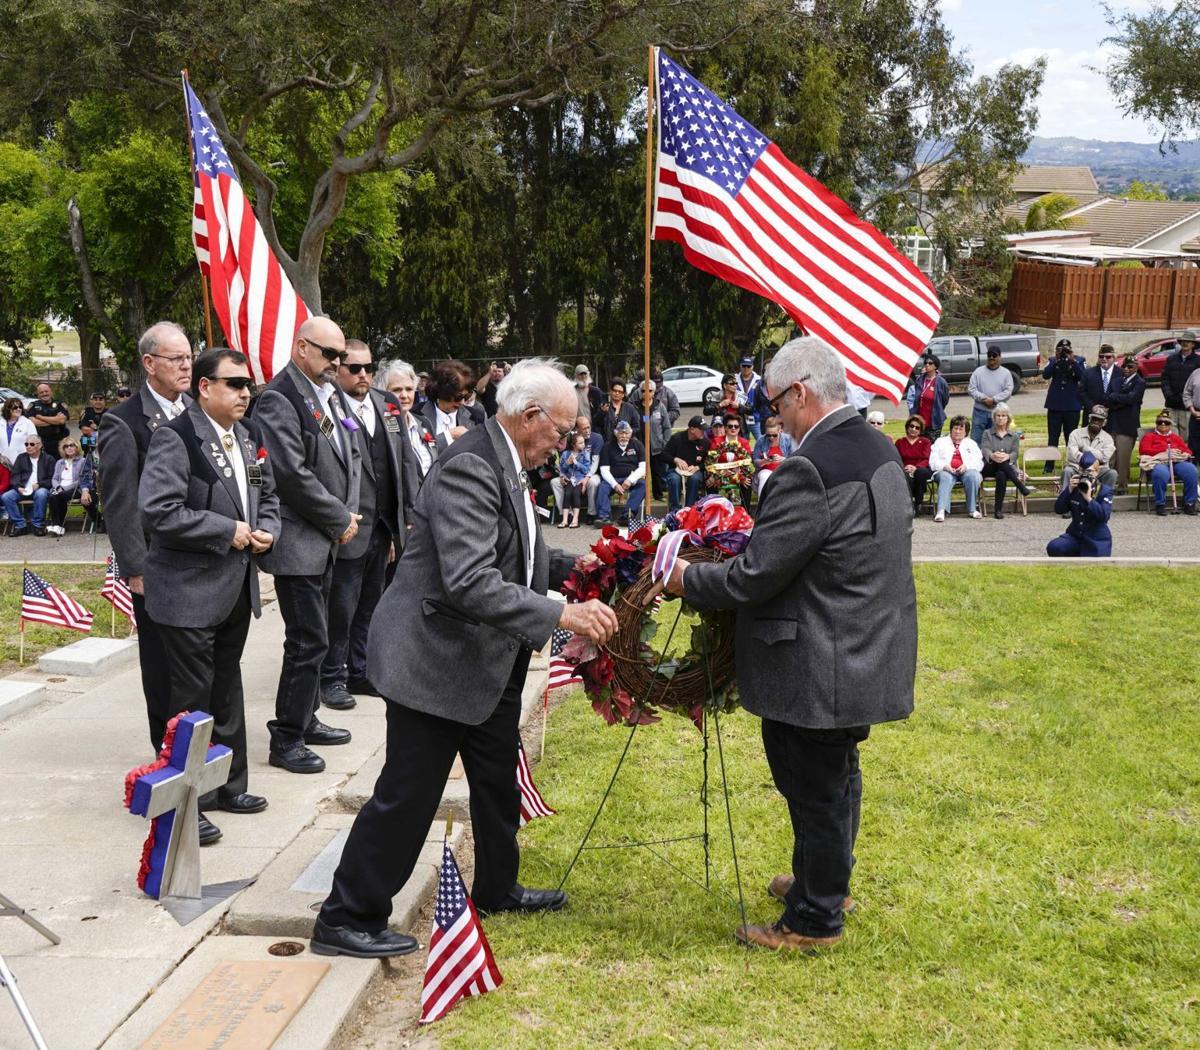 052719 Lompoc Memorial Day 02.jpg